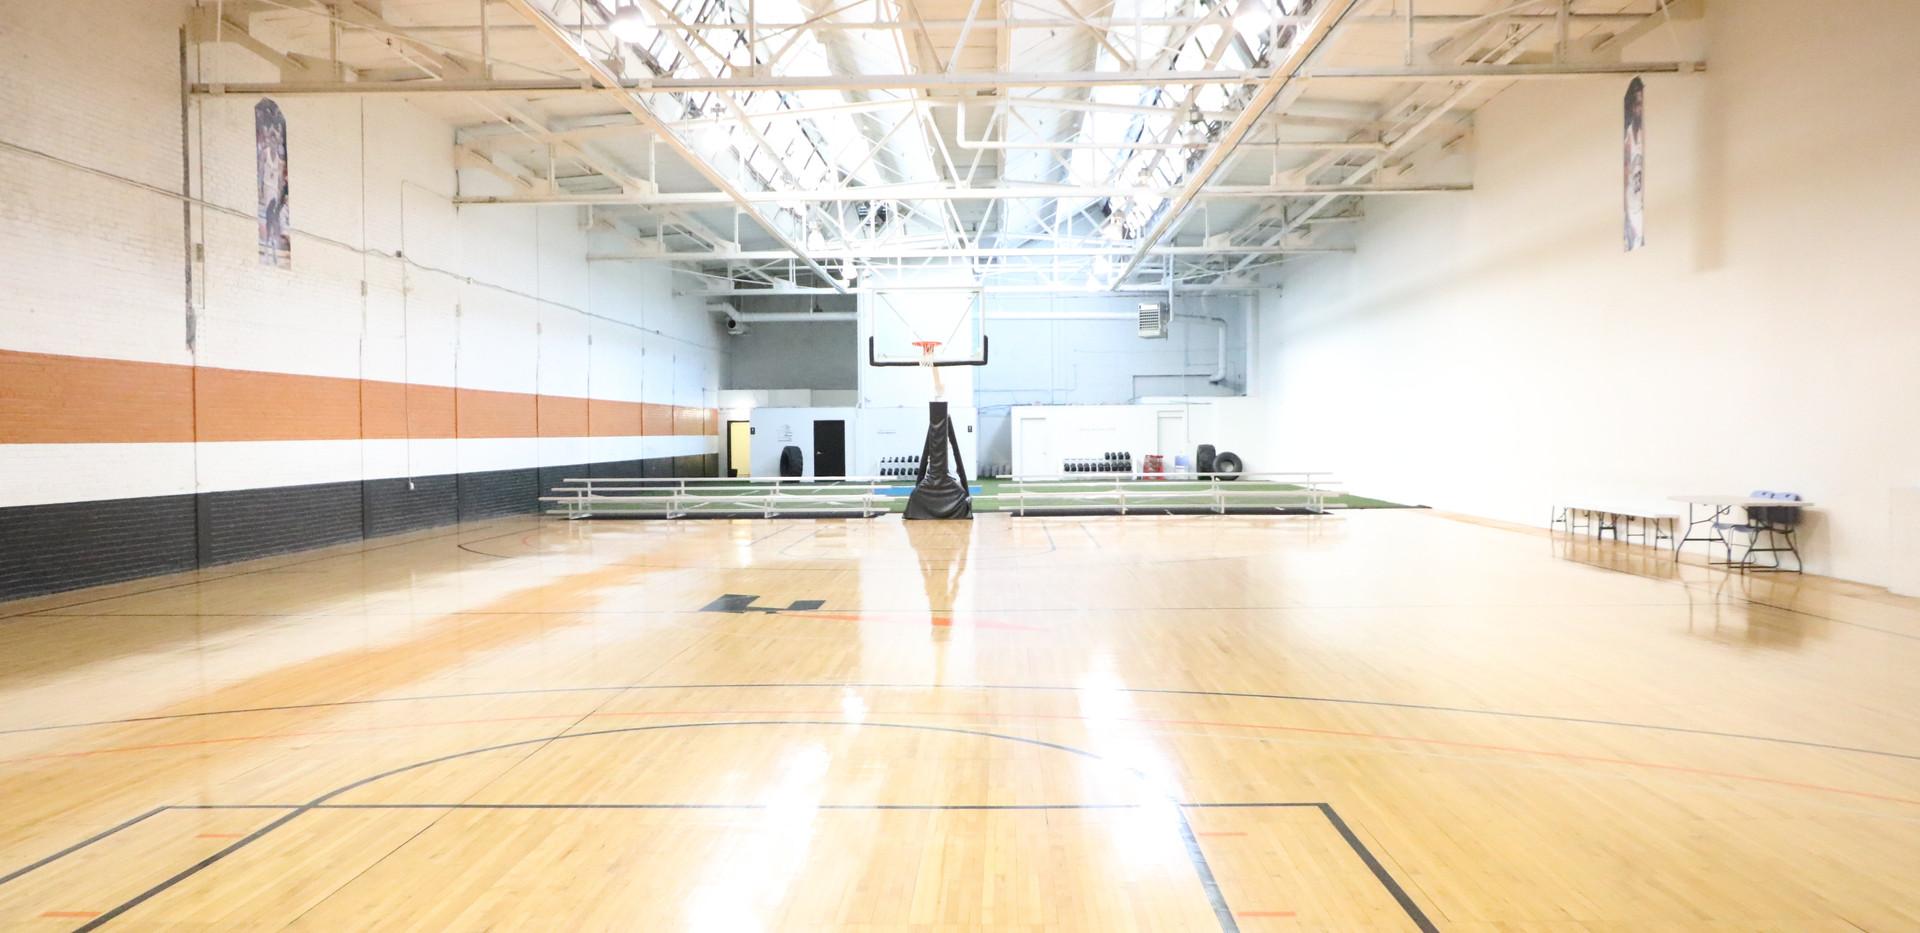 Second Court